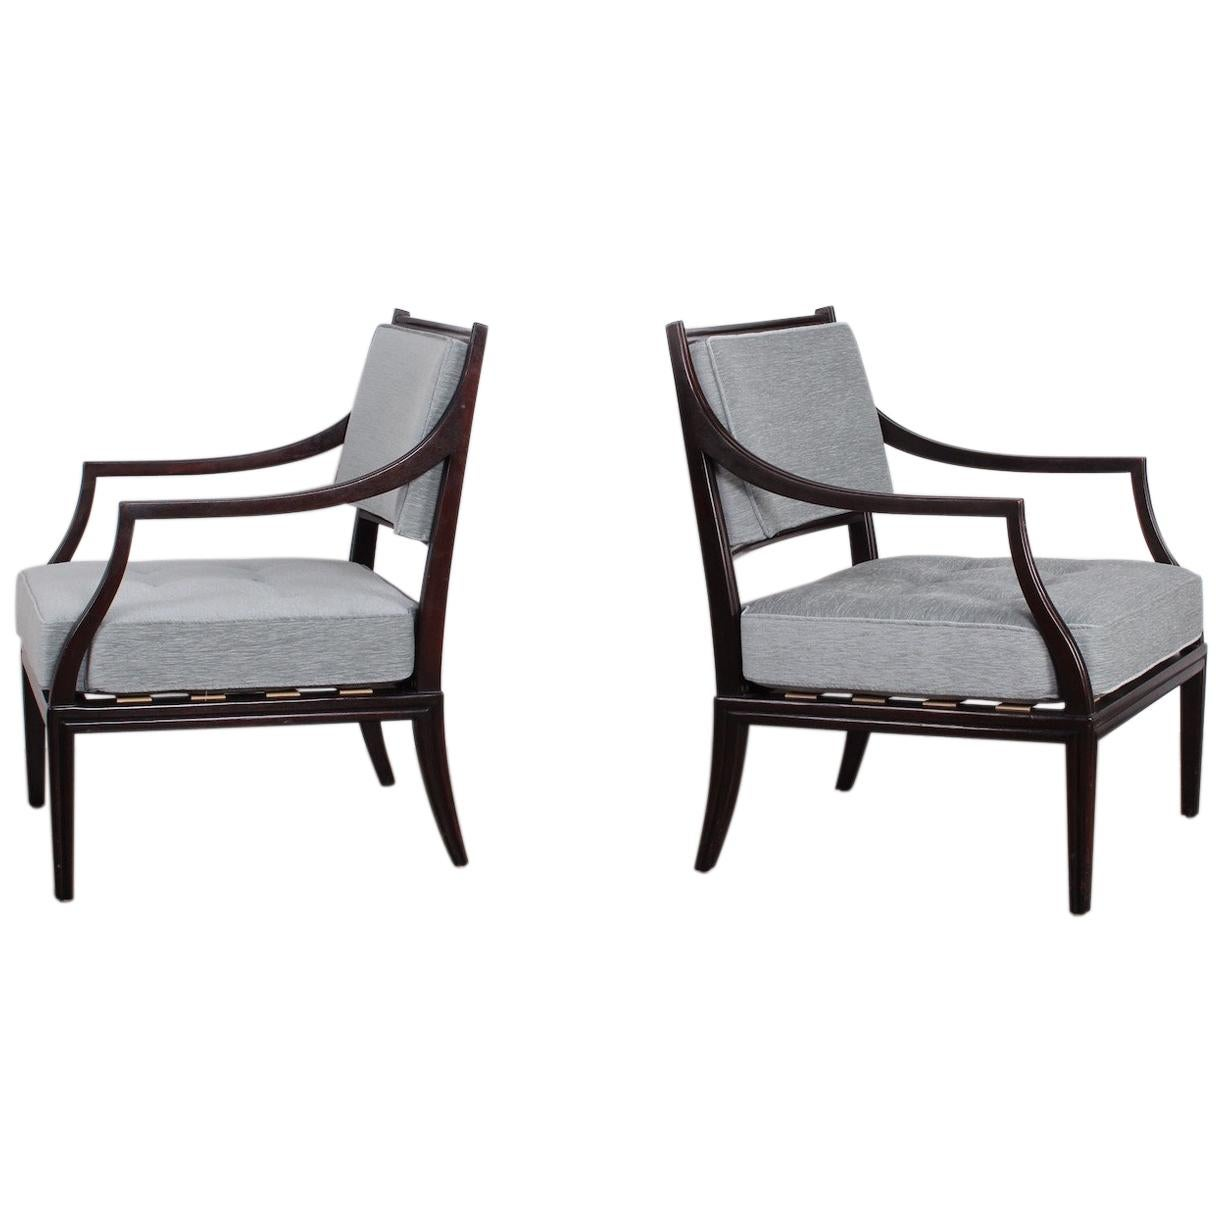 Pair of Dunbar Lounge Chairs